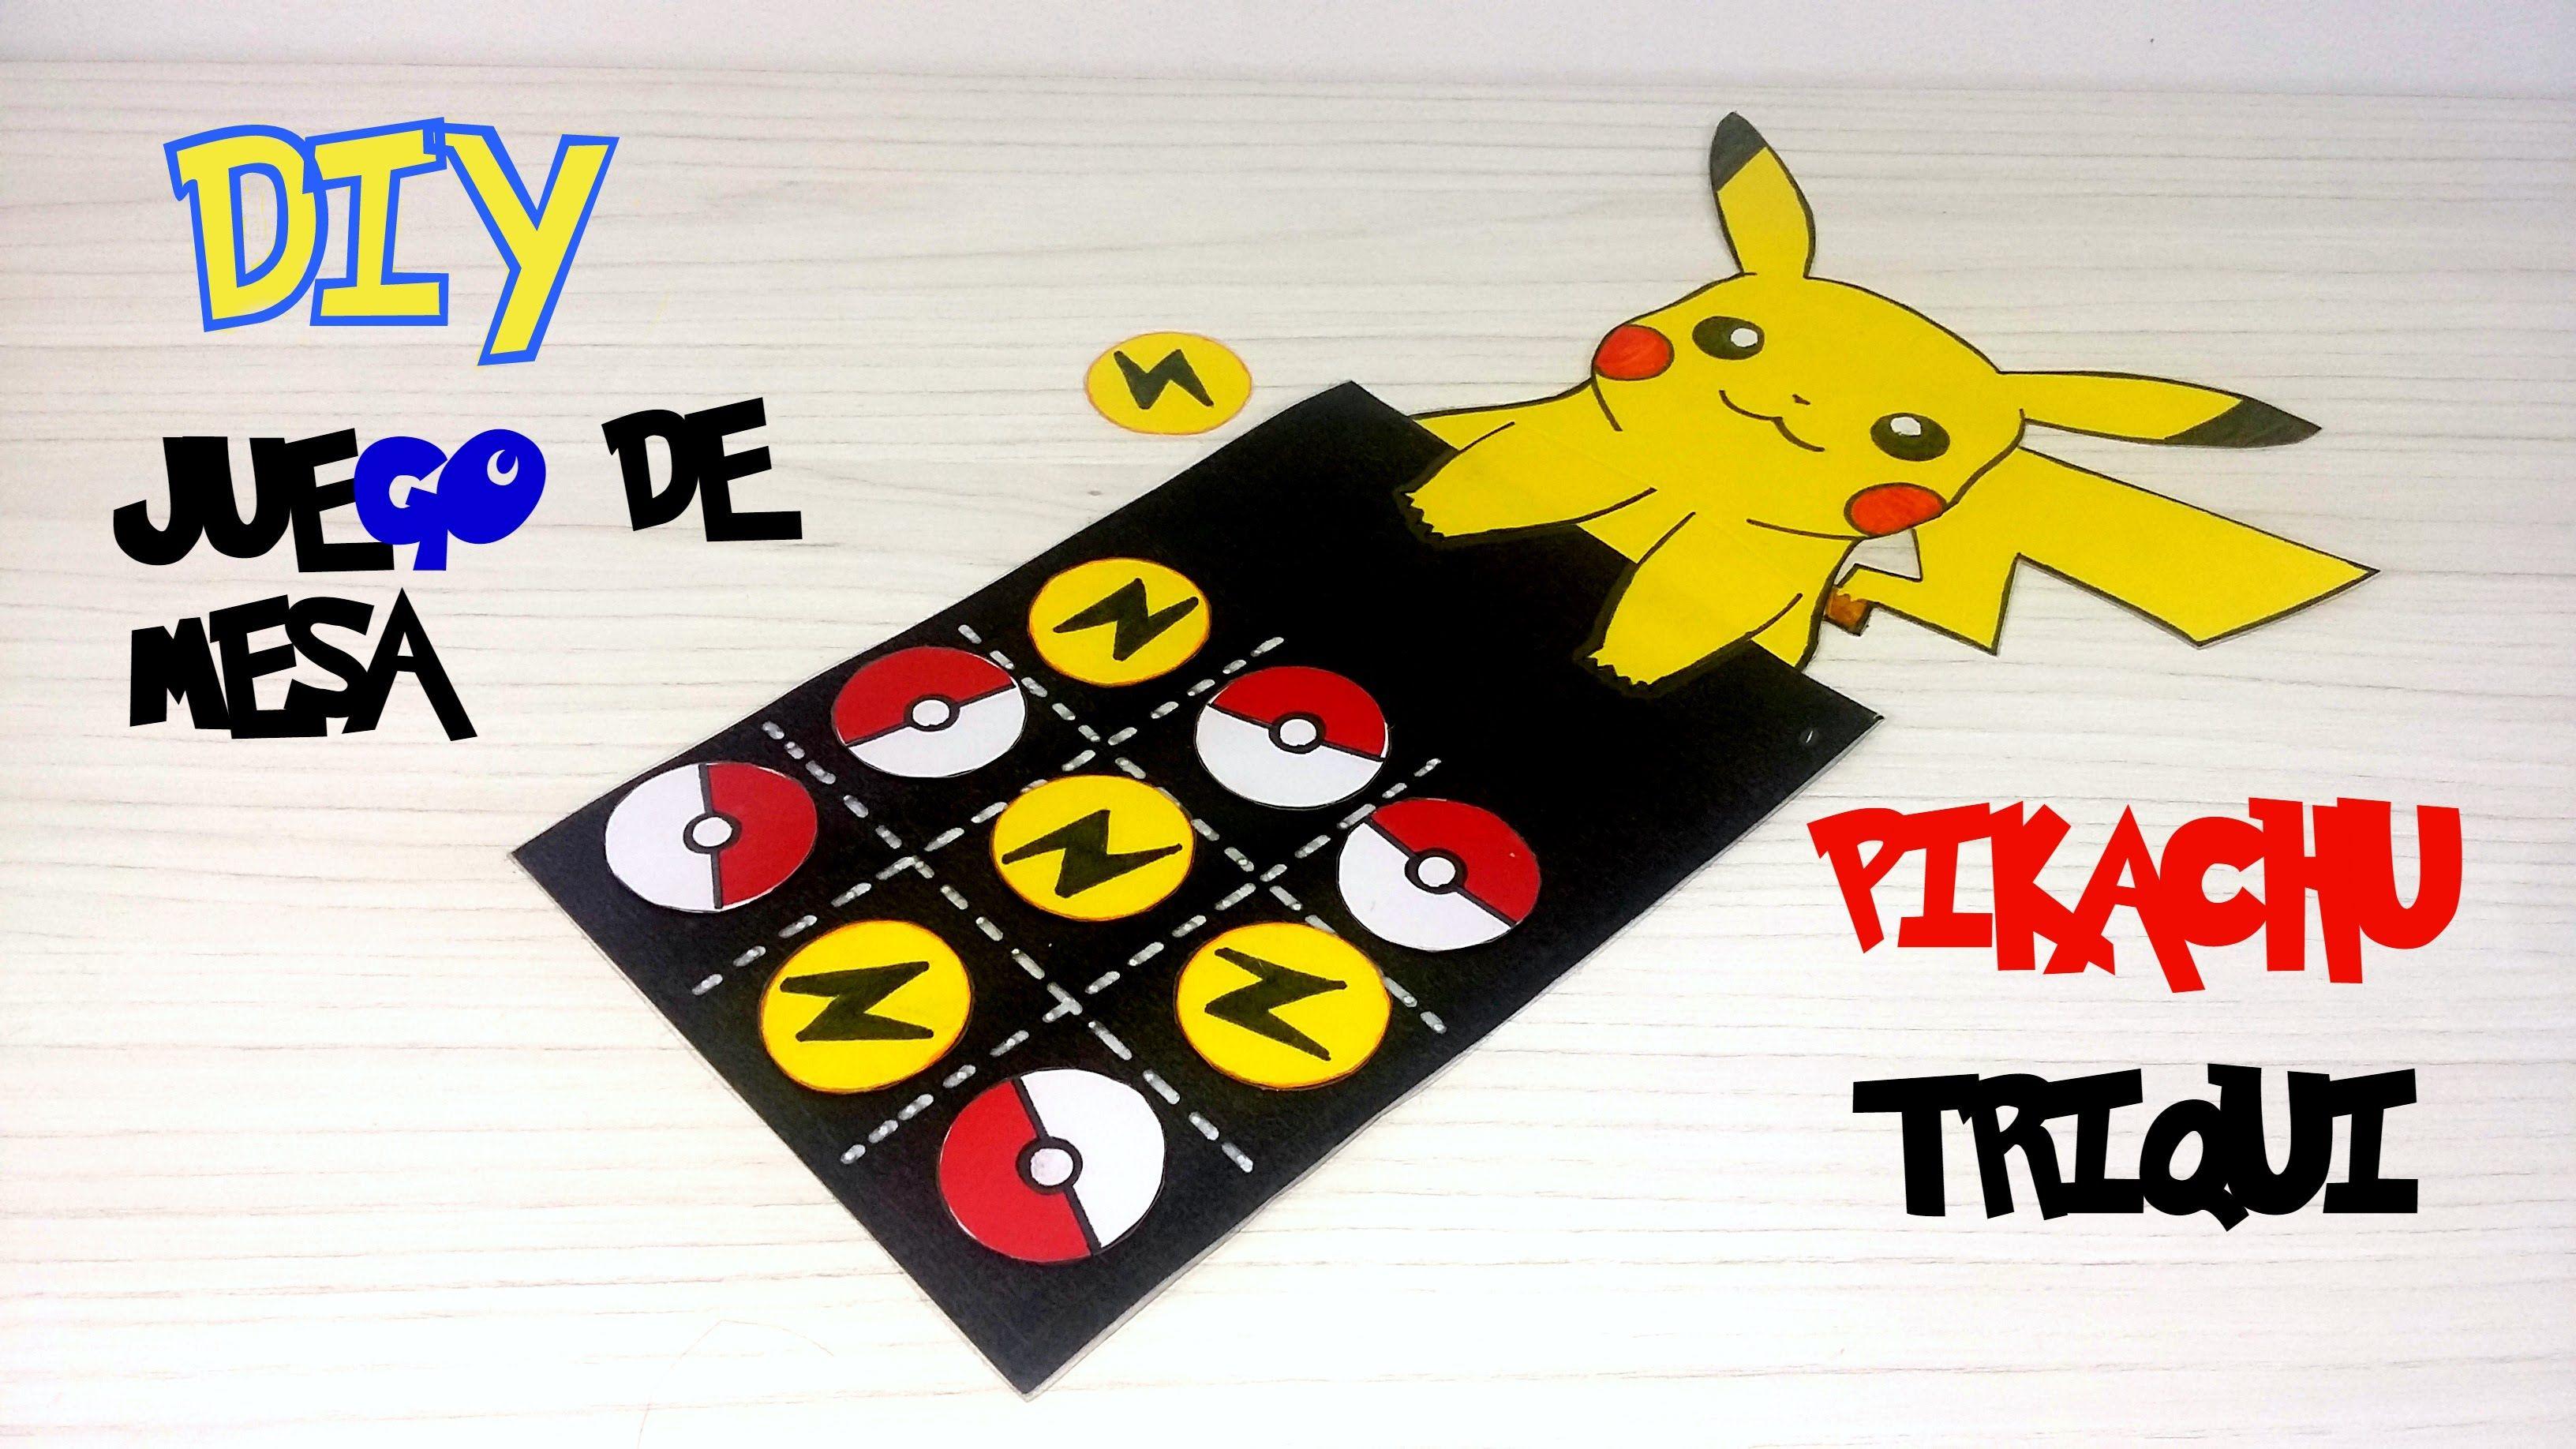 Juego De Mesa Inspirado En Pokemon Go Diy Diy Games Pinterest